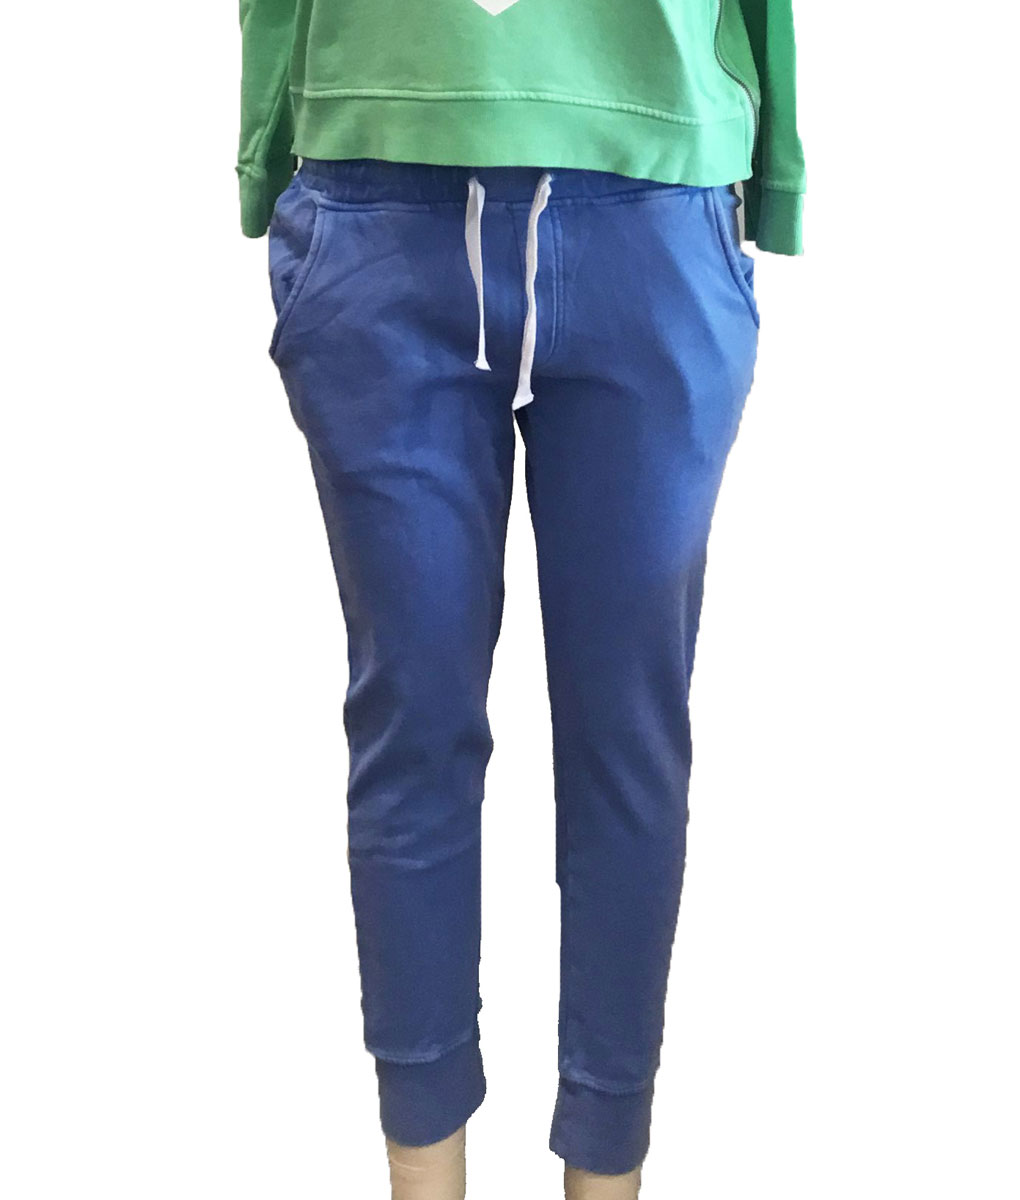 trackpants blue